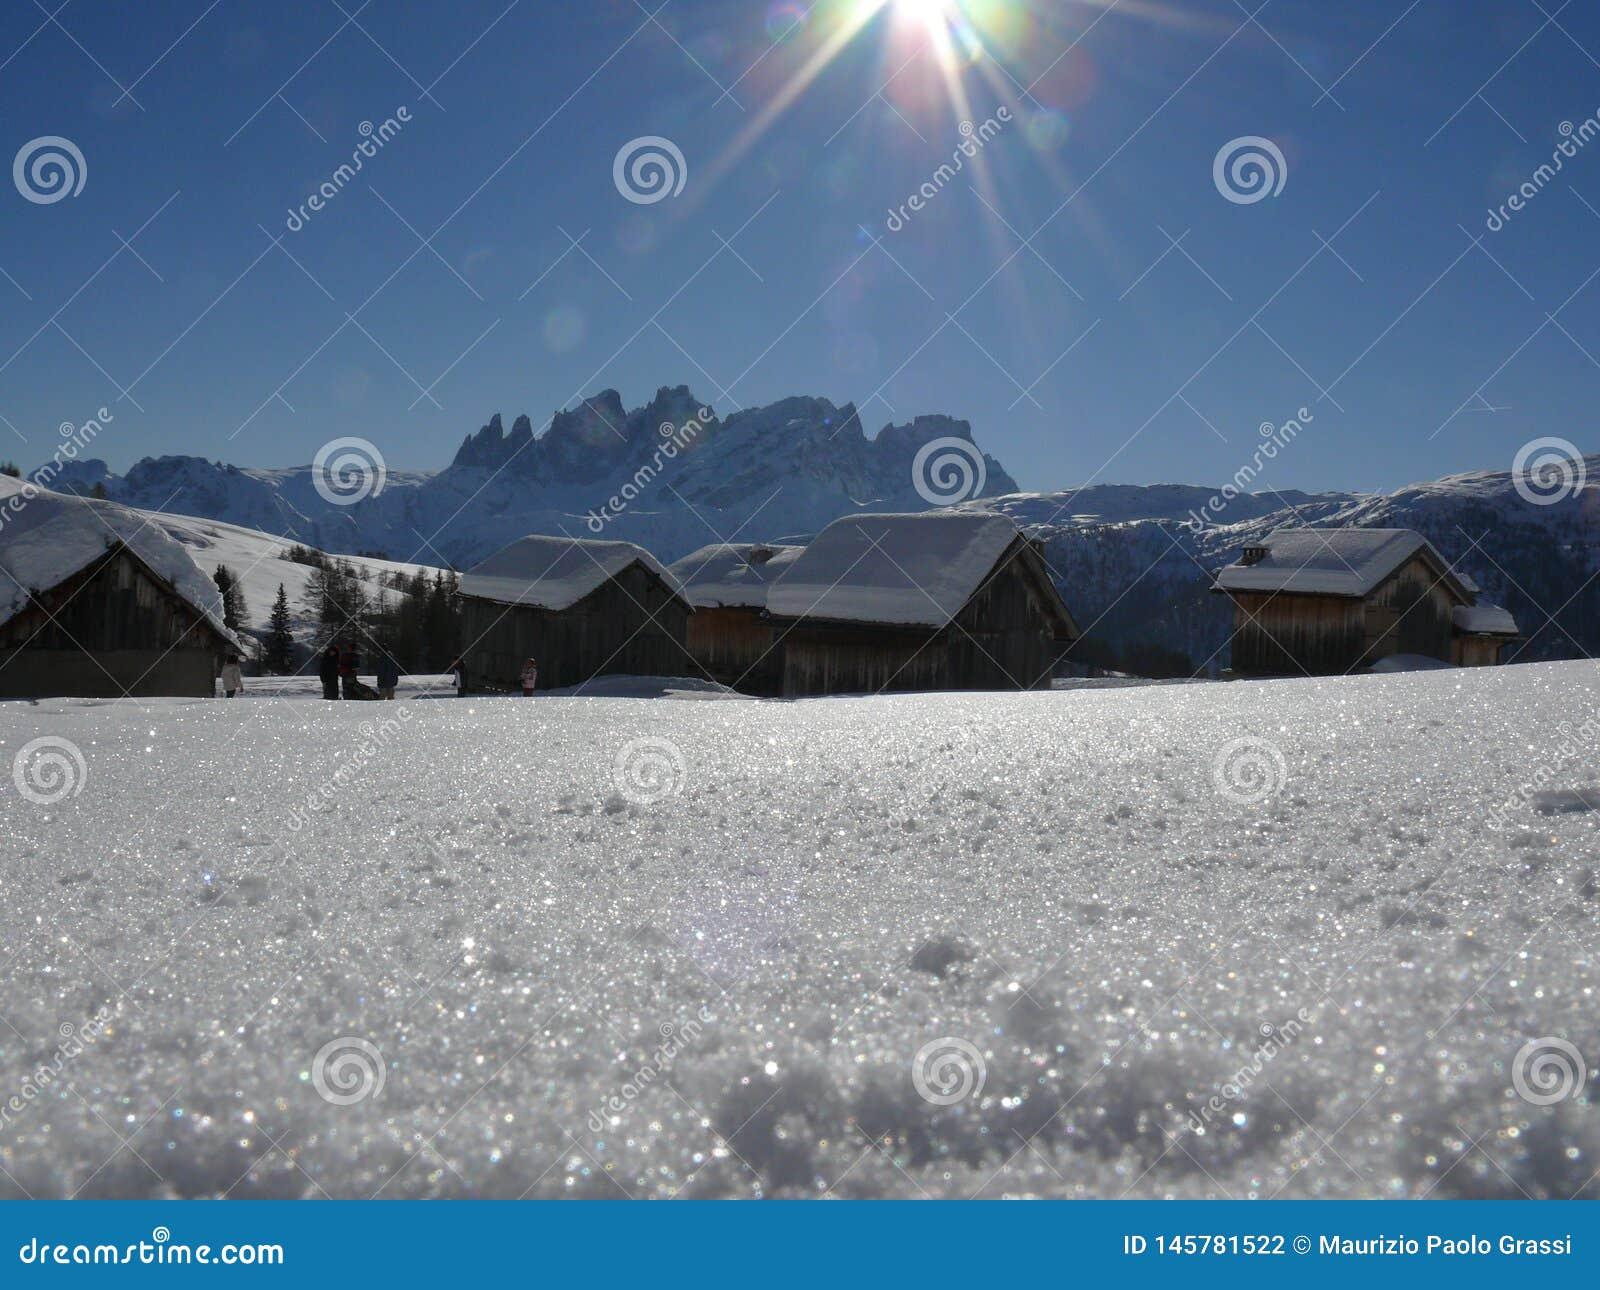 Alpine landscape of the Dolomites with snow. Trentino